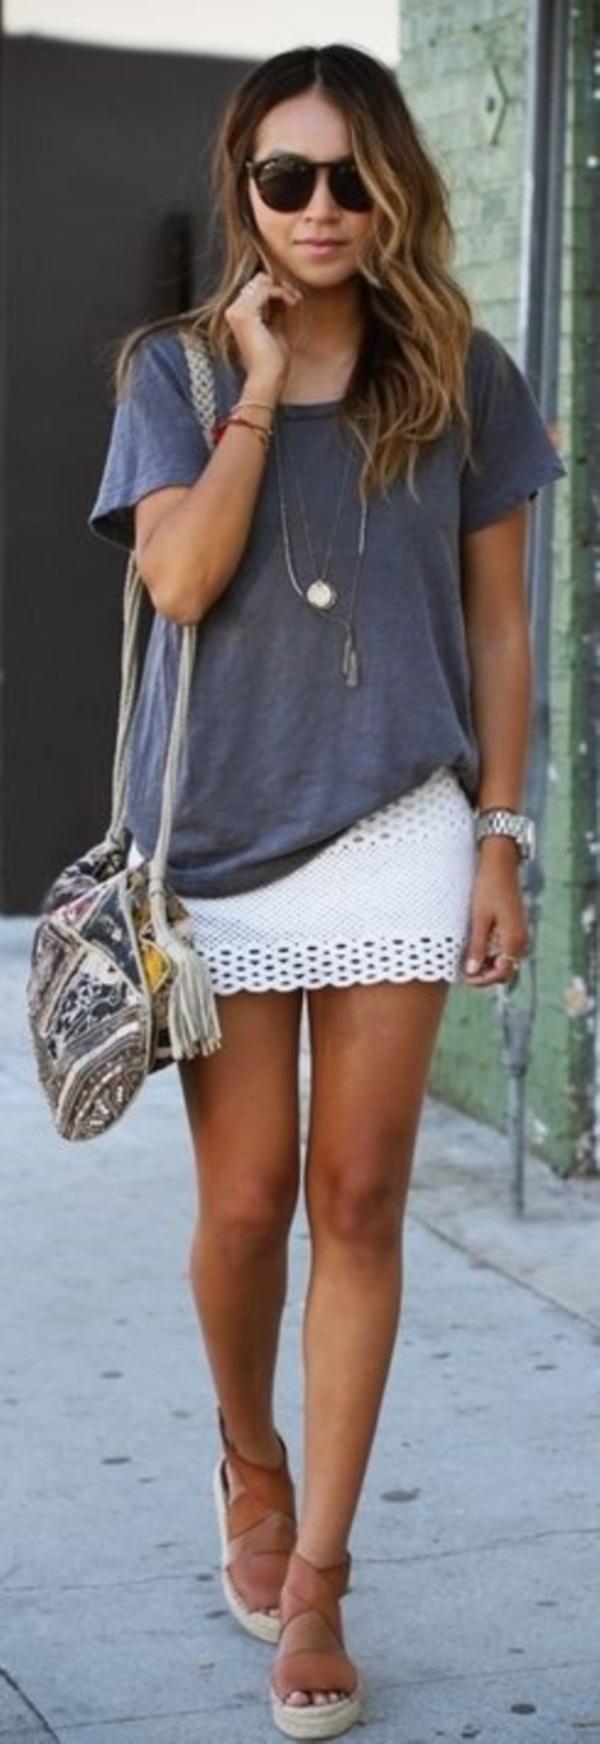 boho chic fashions outfits0371